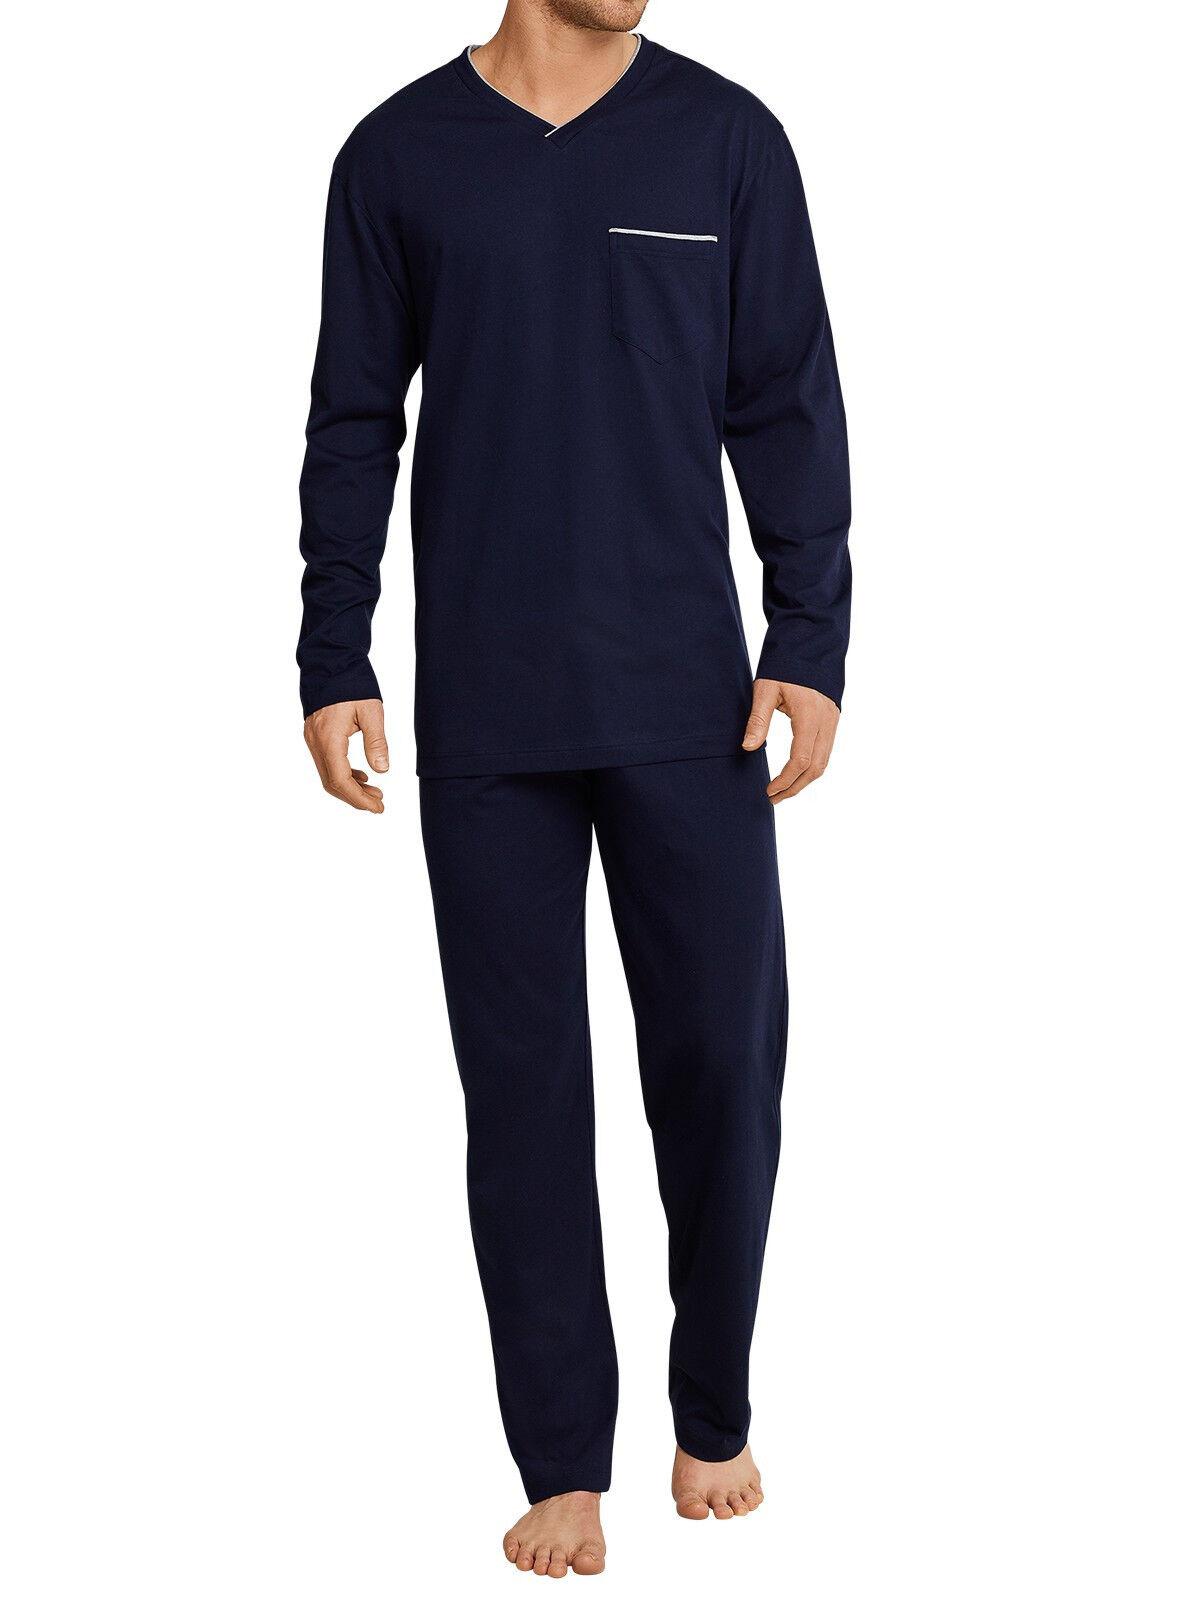 Seidensticker Herren langer Schlafanzug Pyjama Lang - 162687